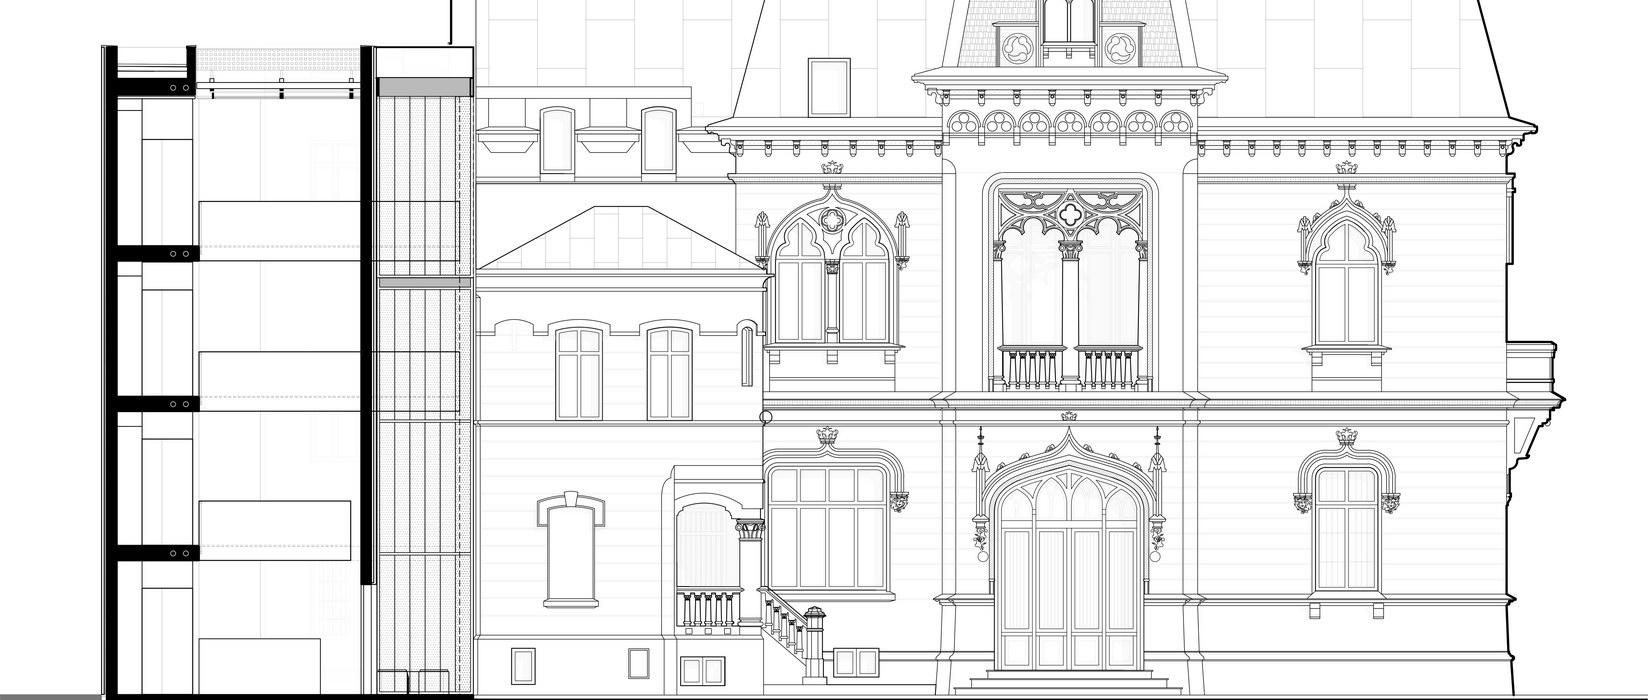 intro-crisan architecture-006_resize